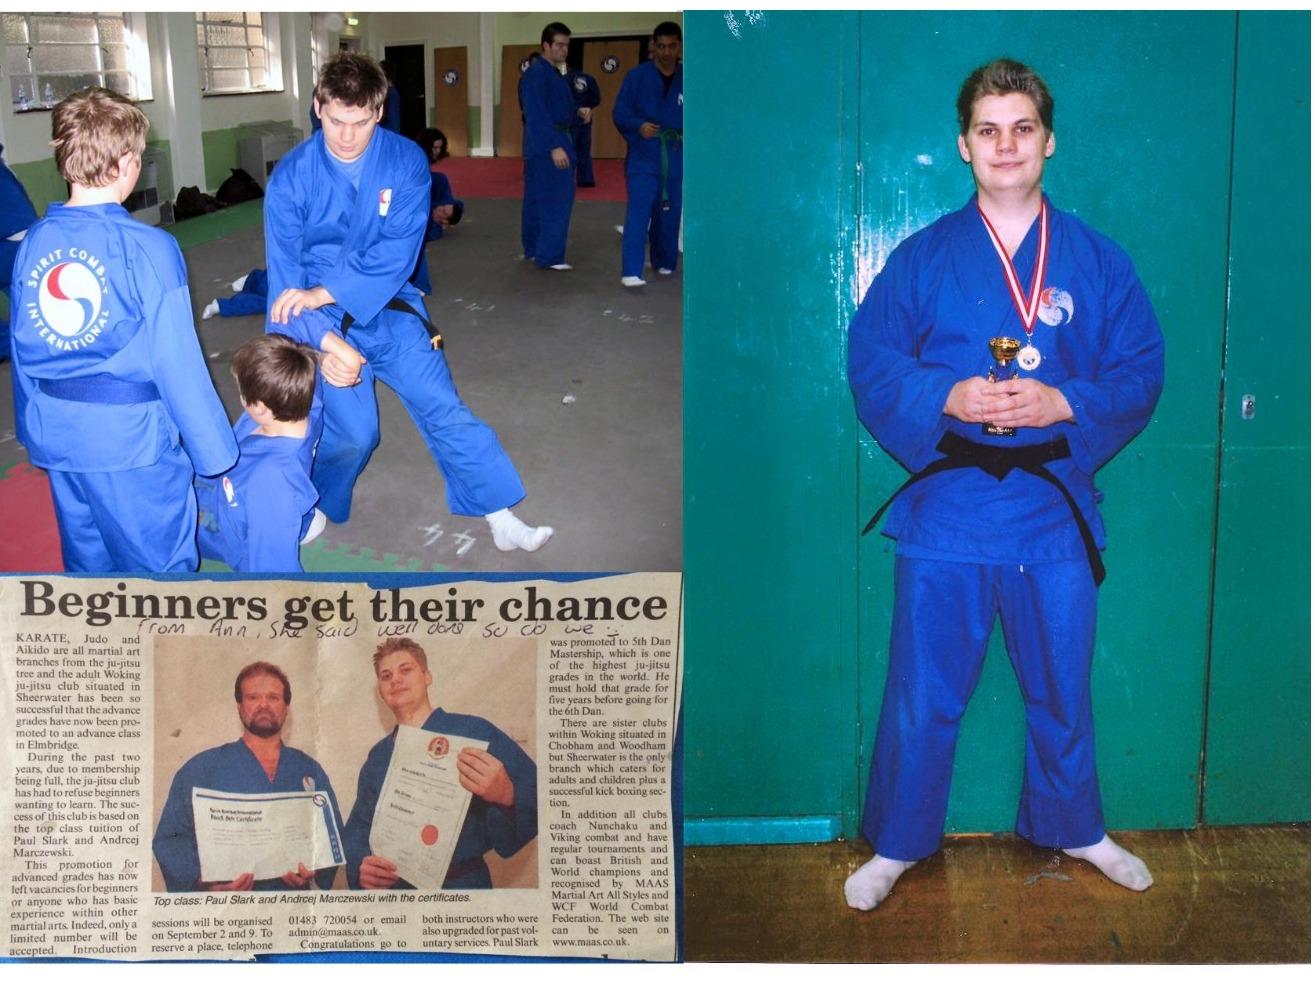 Jujitsu What You Want vs What You Need